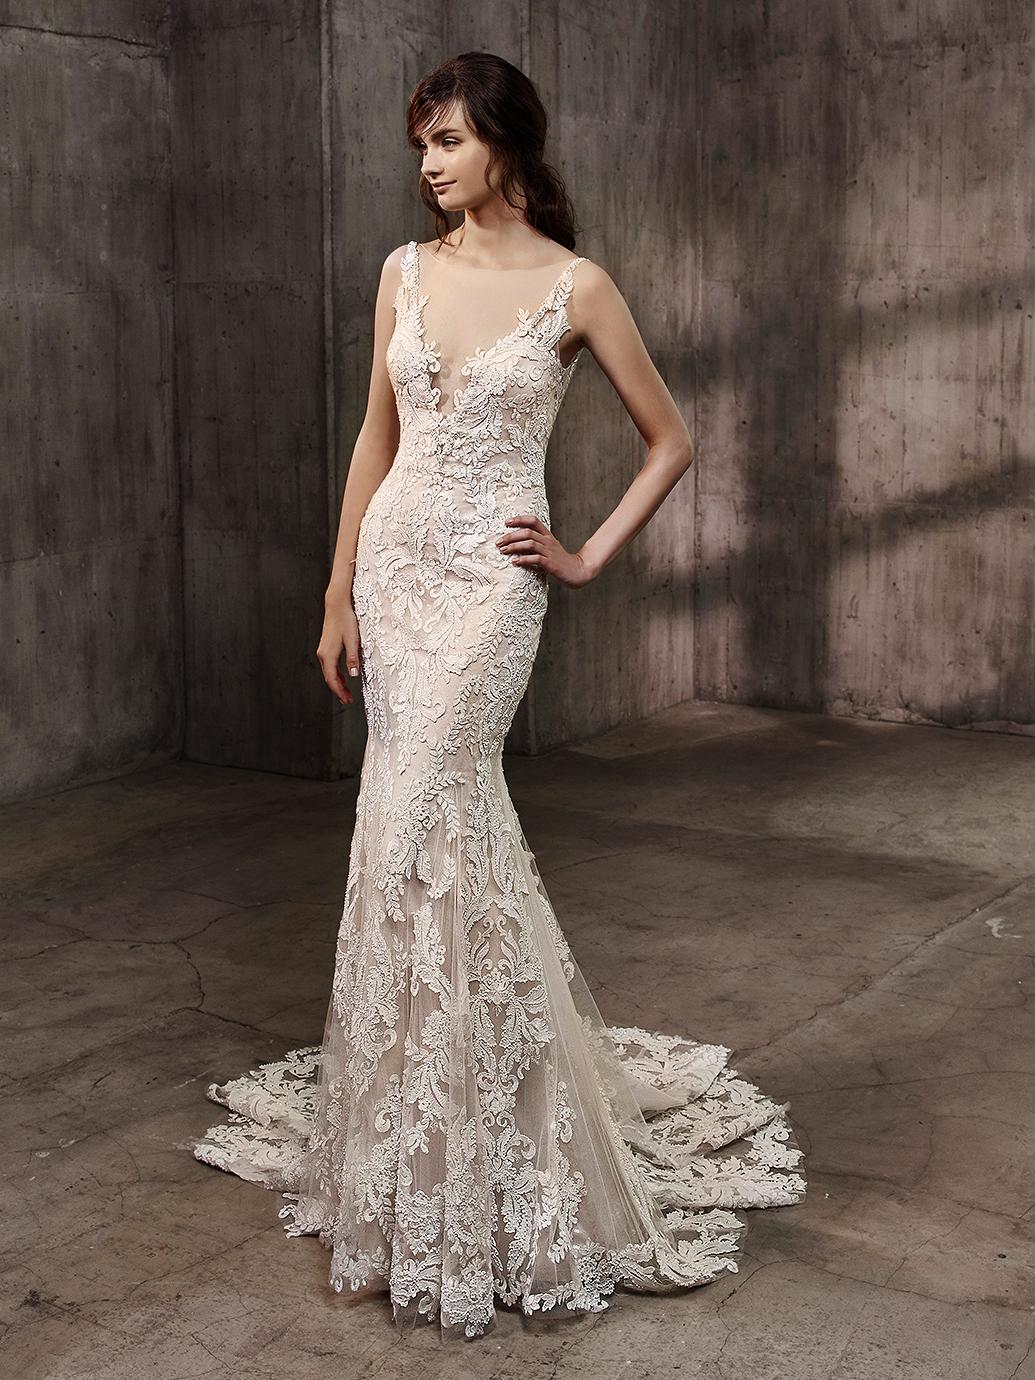 Badgley Mischka 2017 Wedding Dress Collection